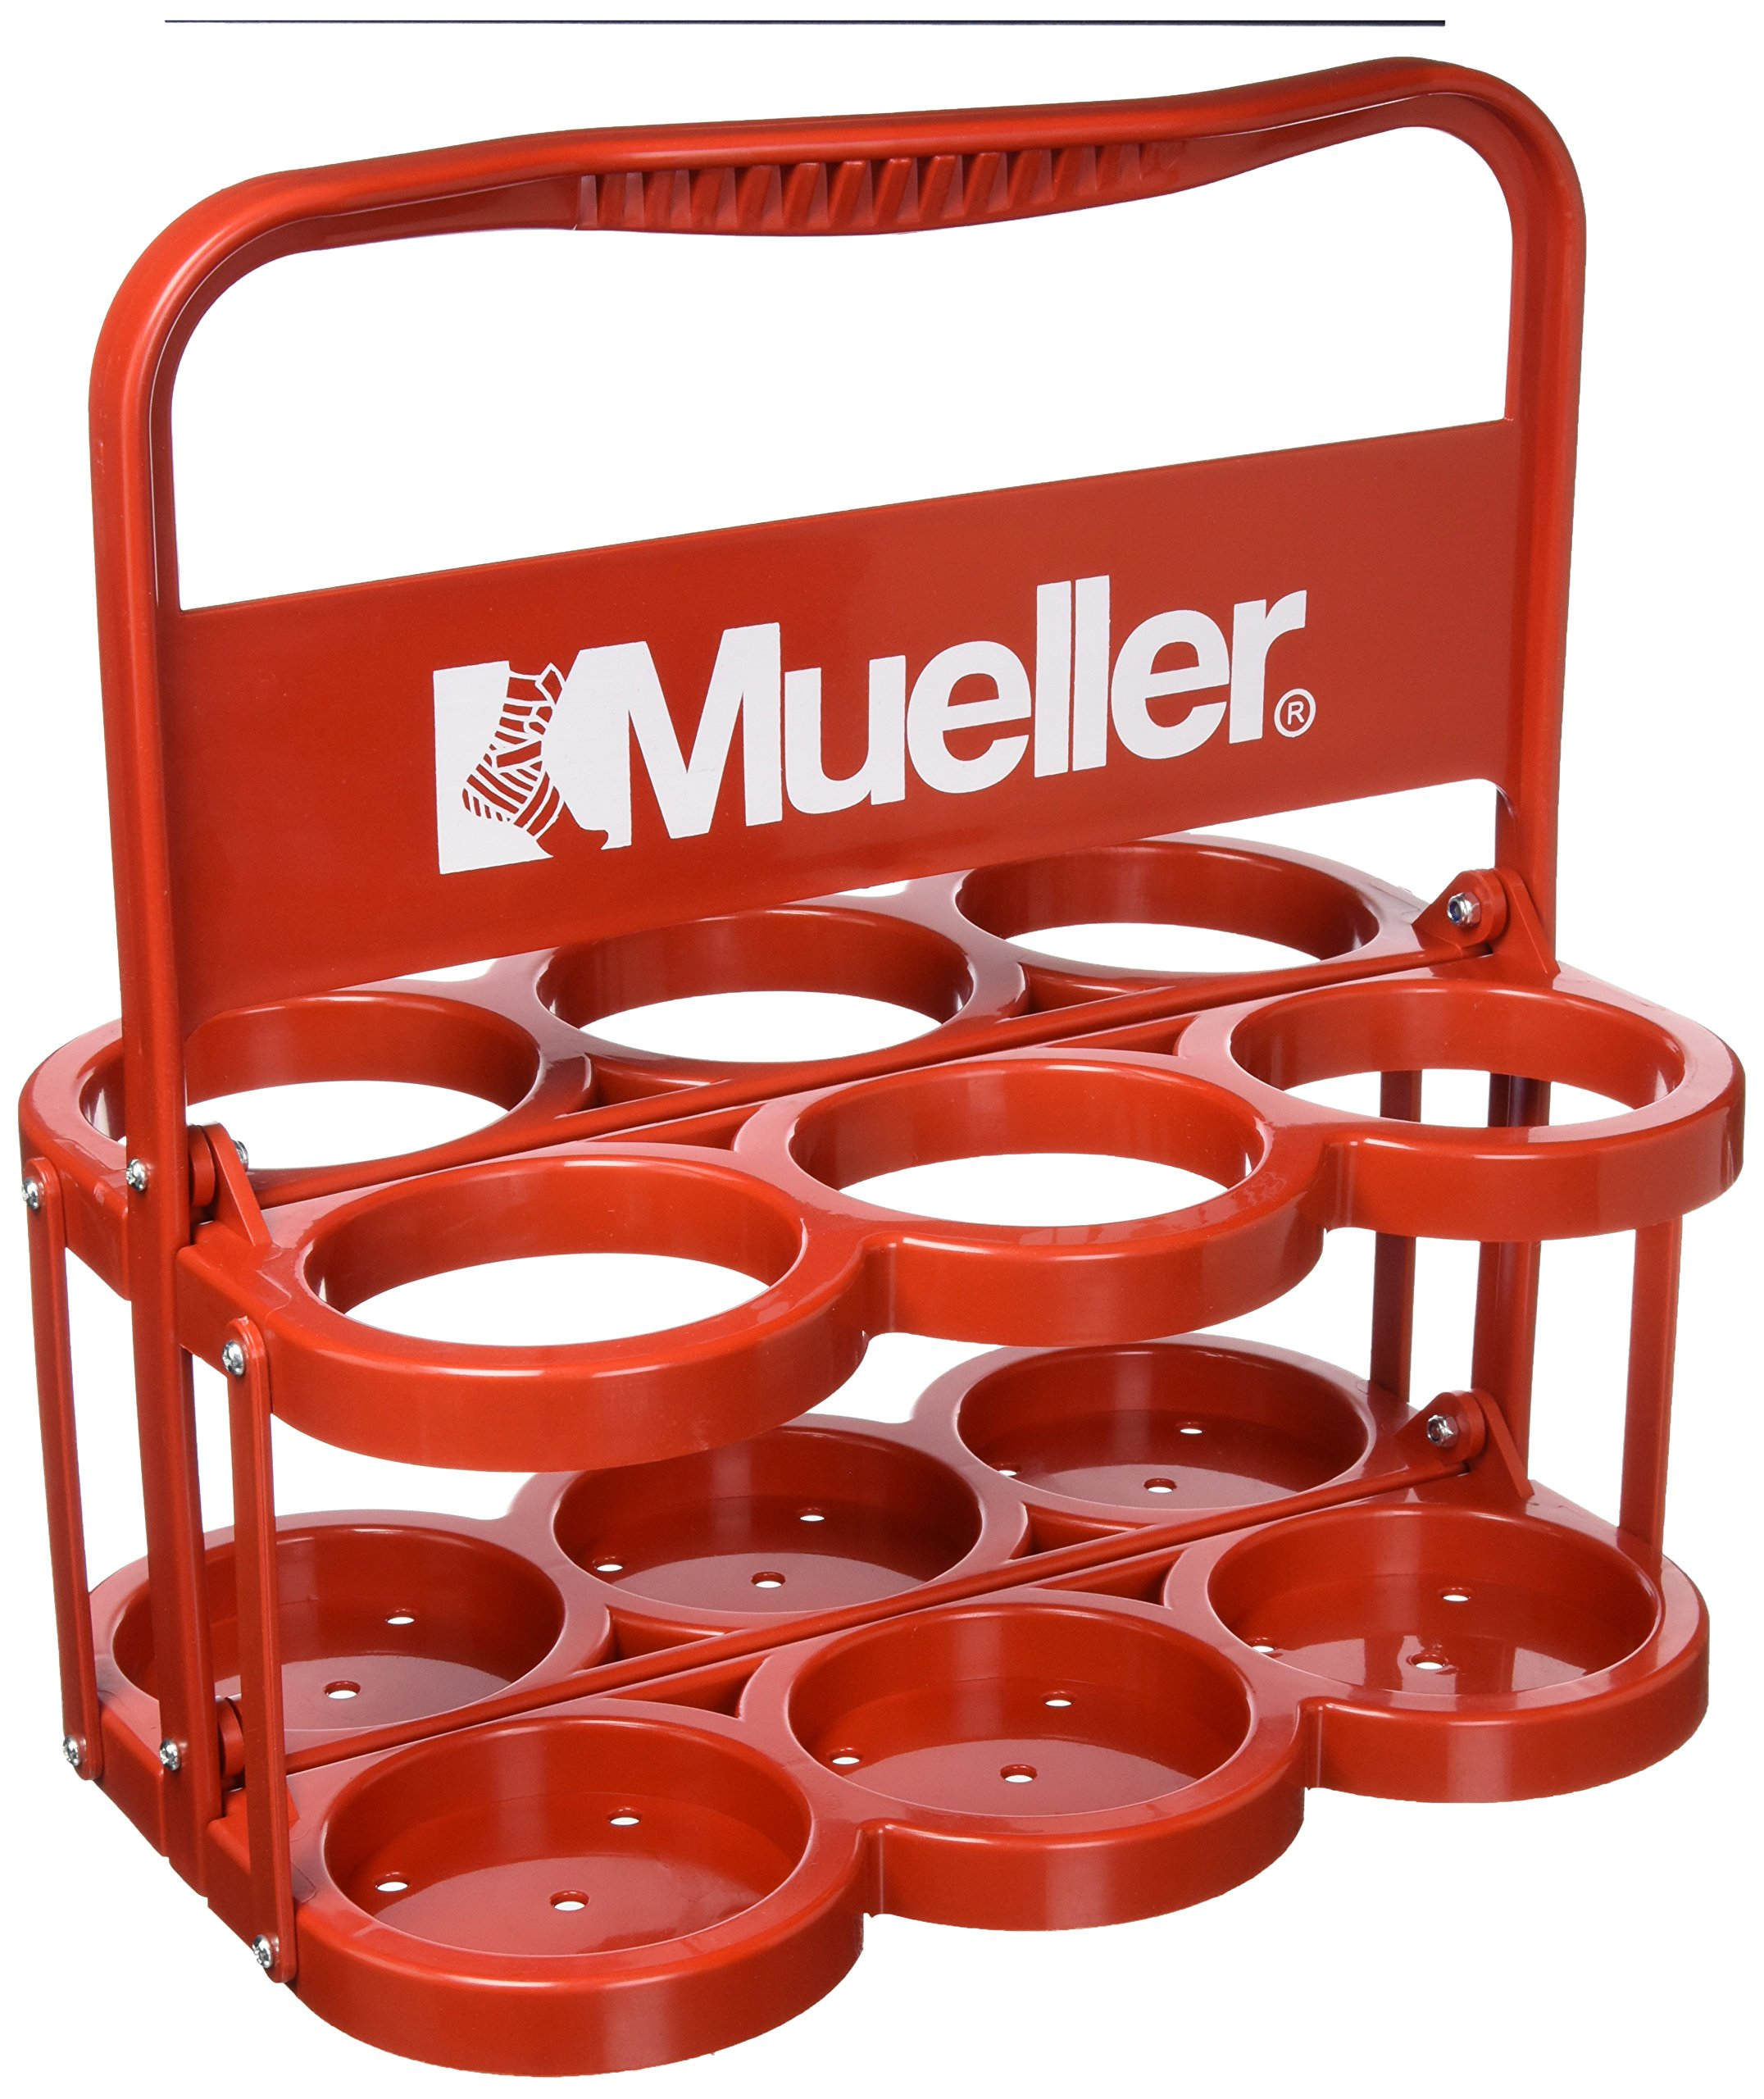 MUELLER Sports Medicine 596939 Water Bottles, Plastic Bottle Carrier- Red by Mueller